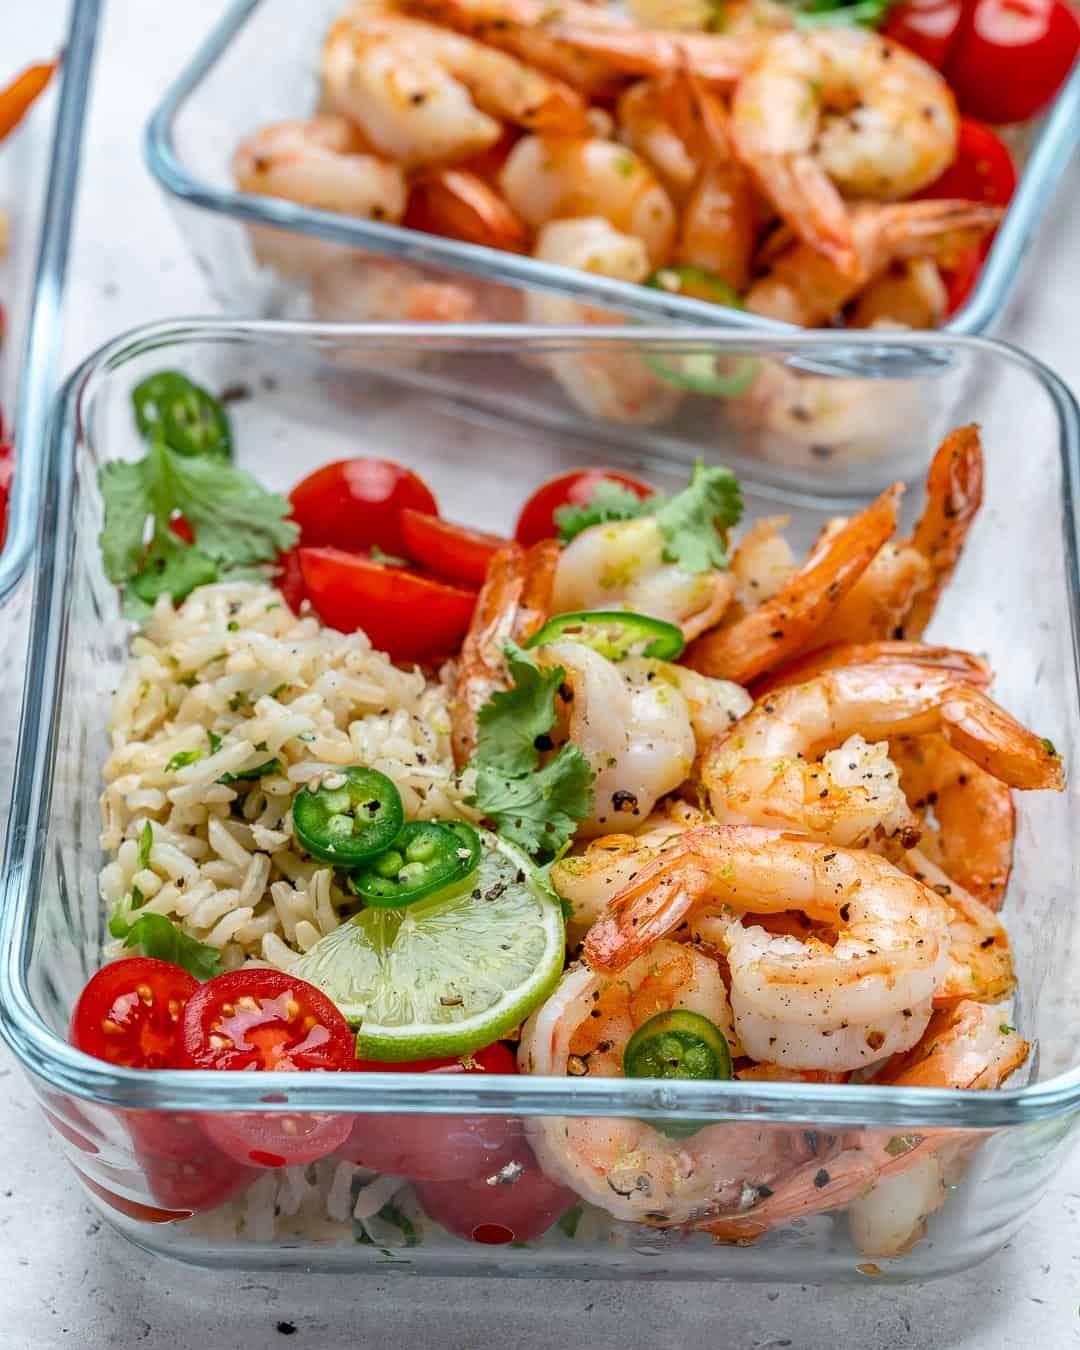 Garlic Lime Shrimp Meal Prep Recipe Healthy Fitness Meals